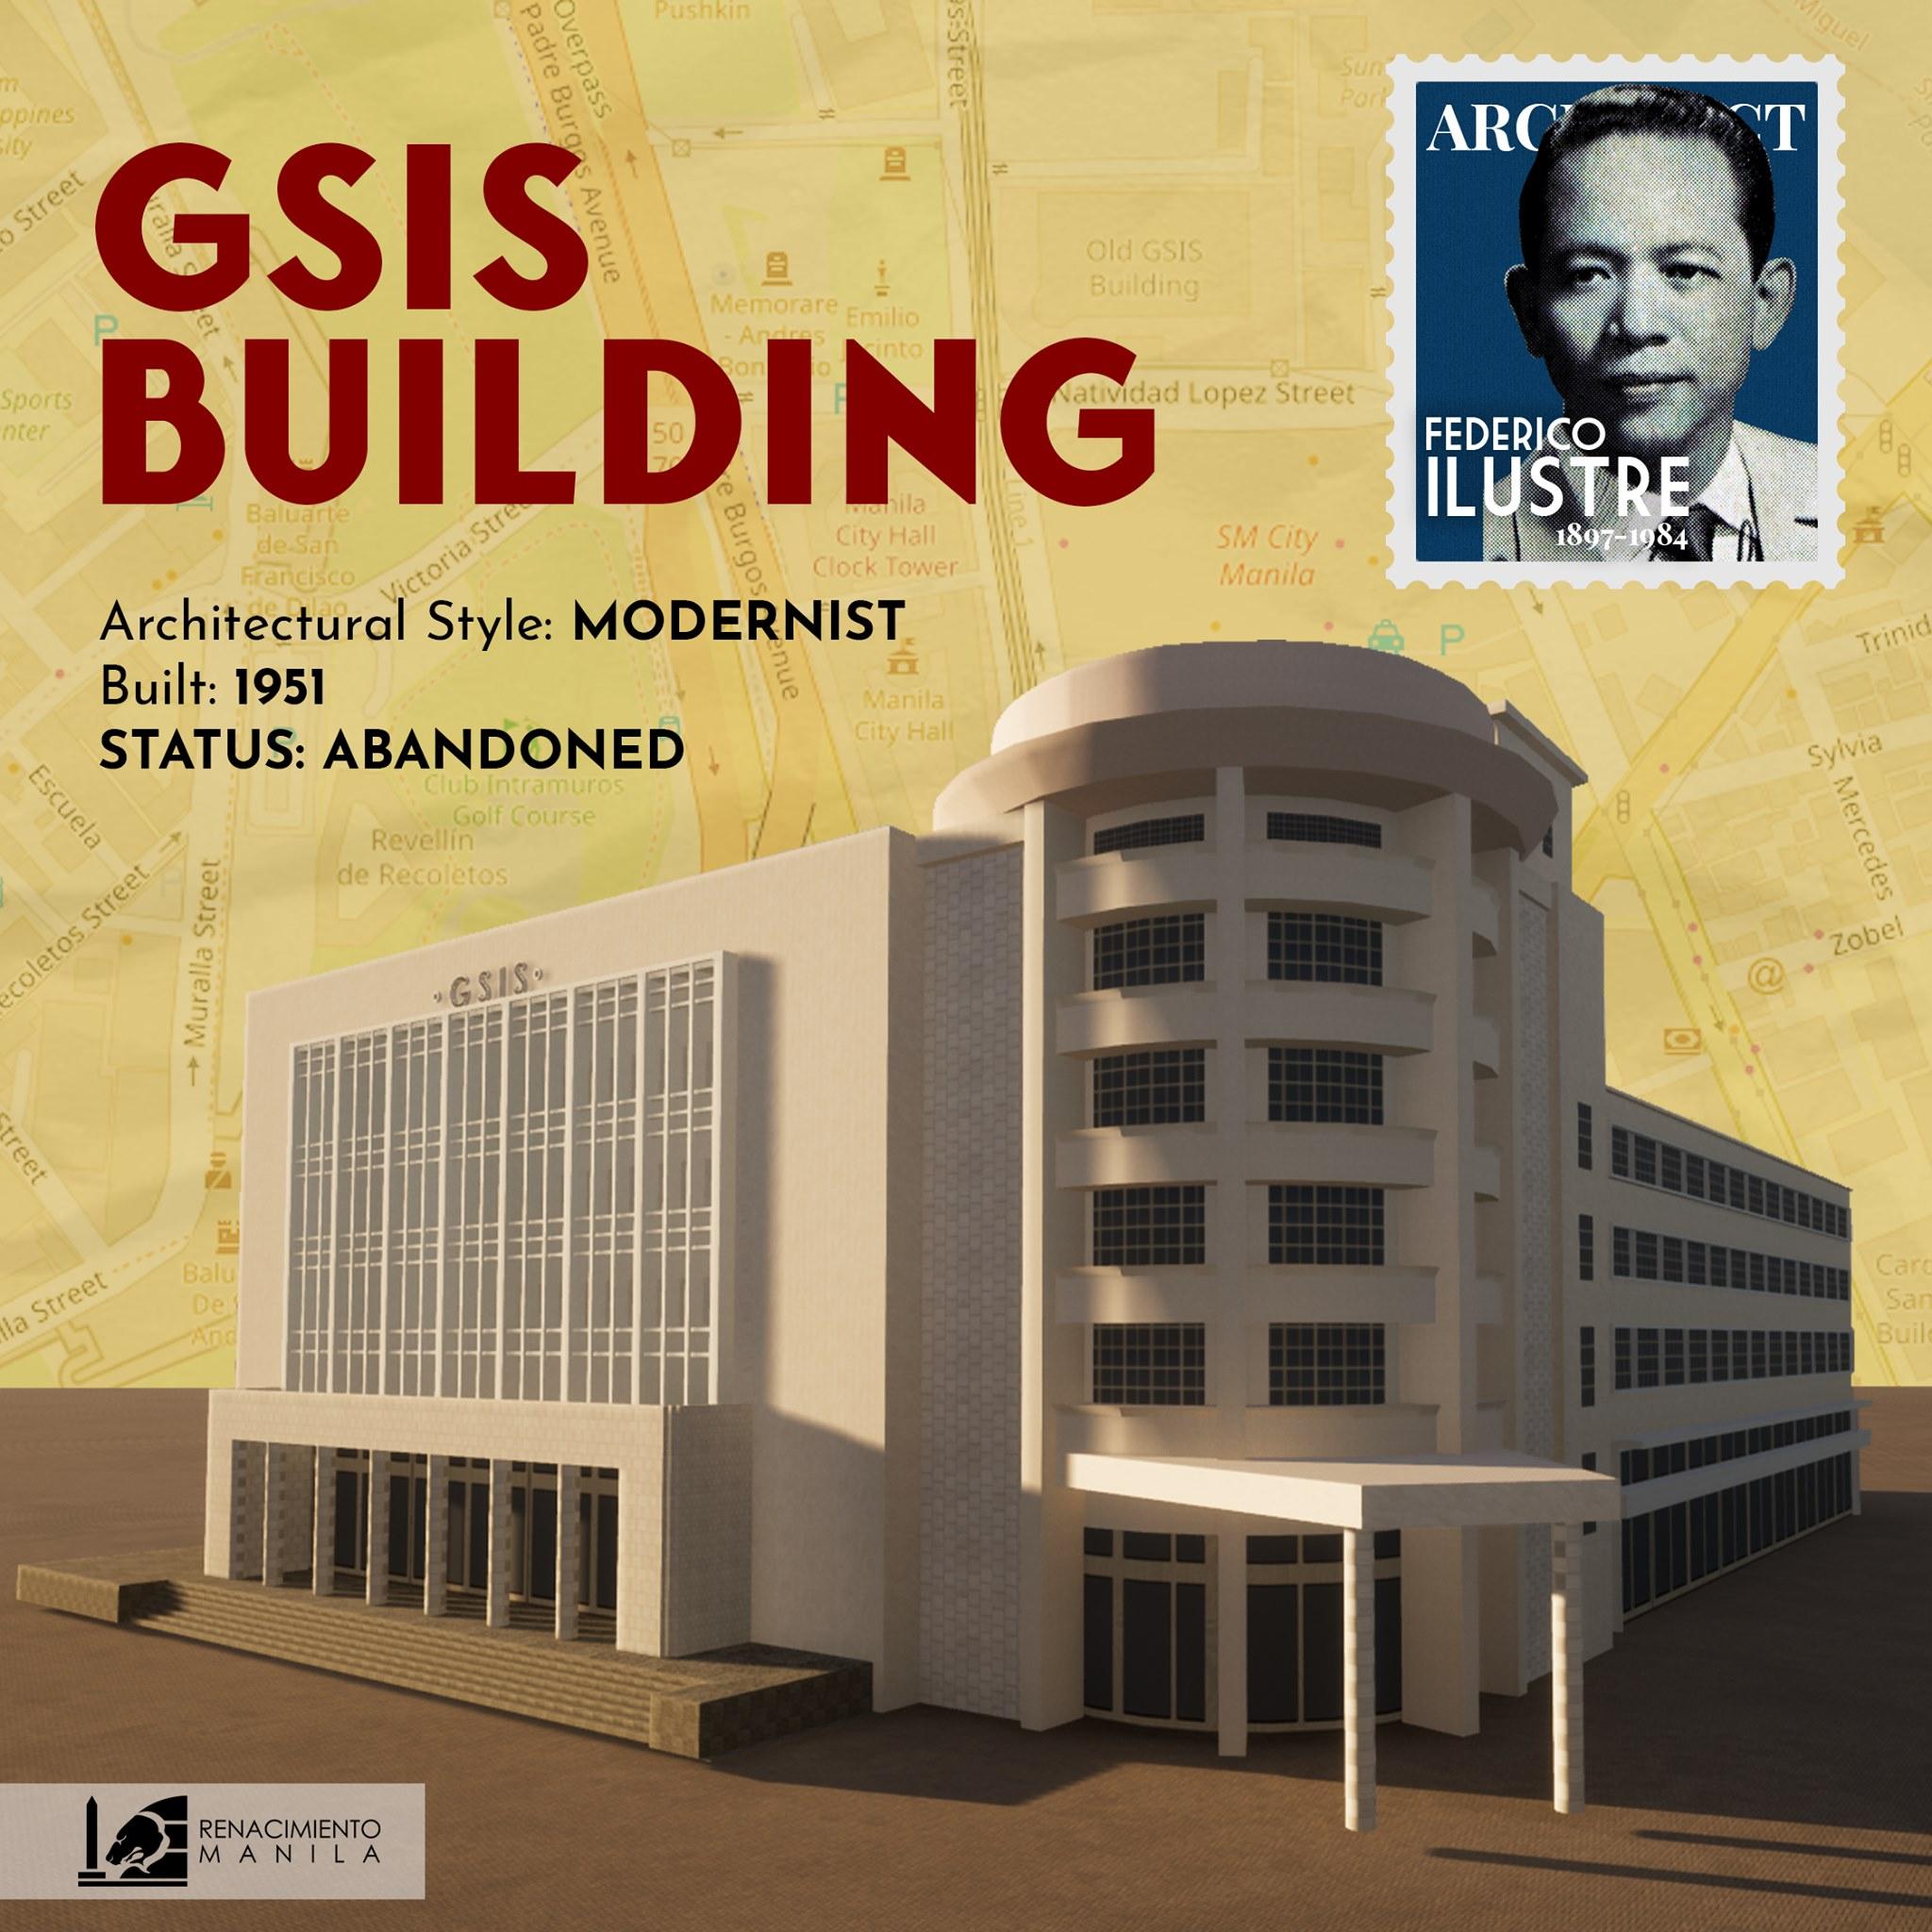 GSIS Building - Federico Ilustre (1912-1989)